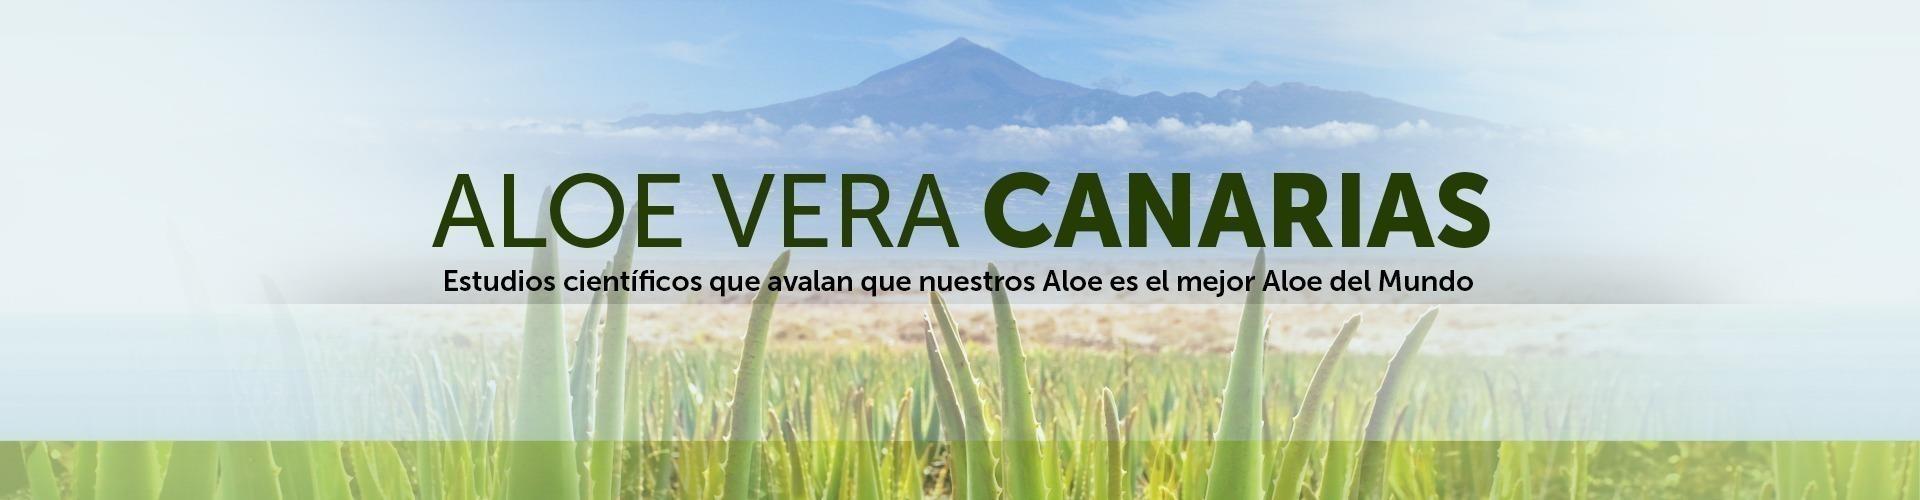 Aloe Vera de Canarias Penca Zabila